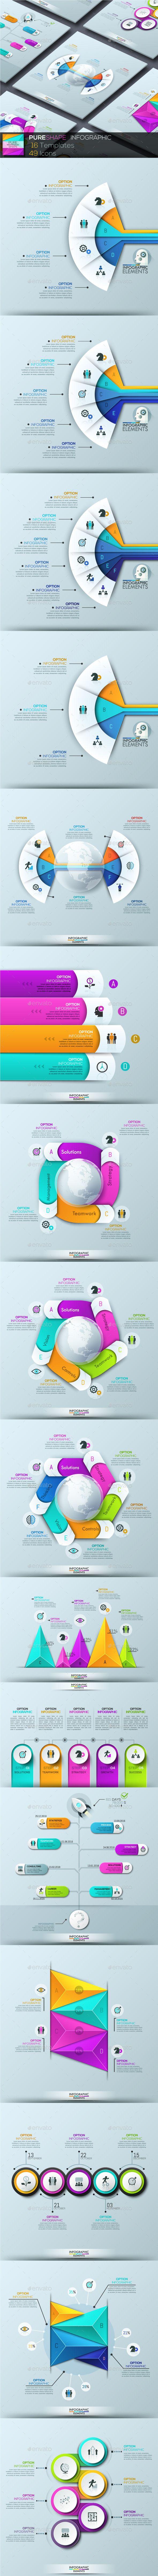 Pure Shape Infographic Template PSD, Vector EPS, AI Illustrator